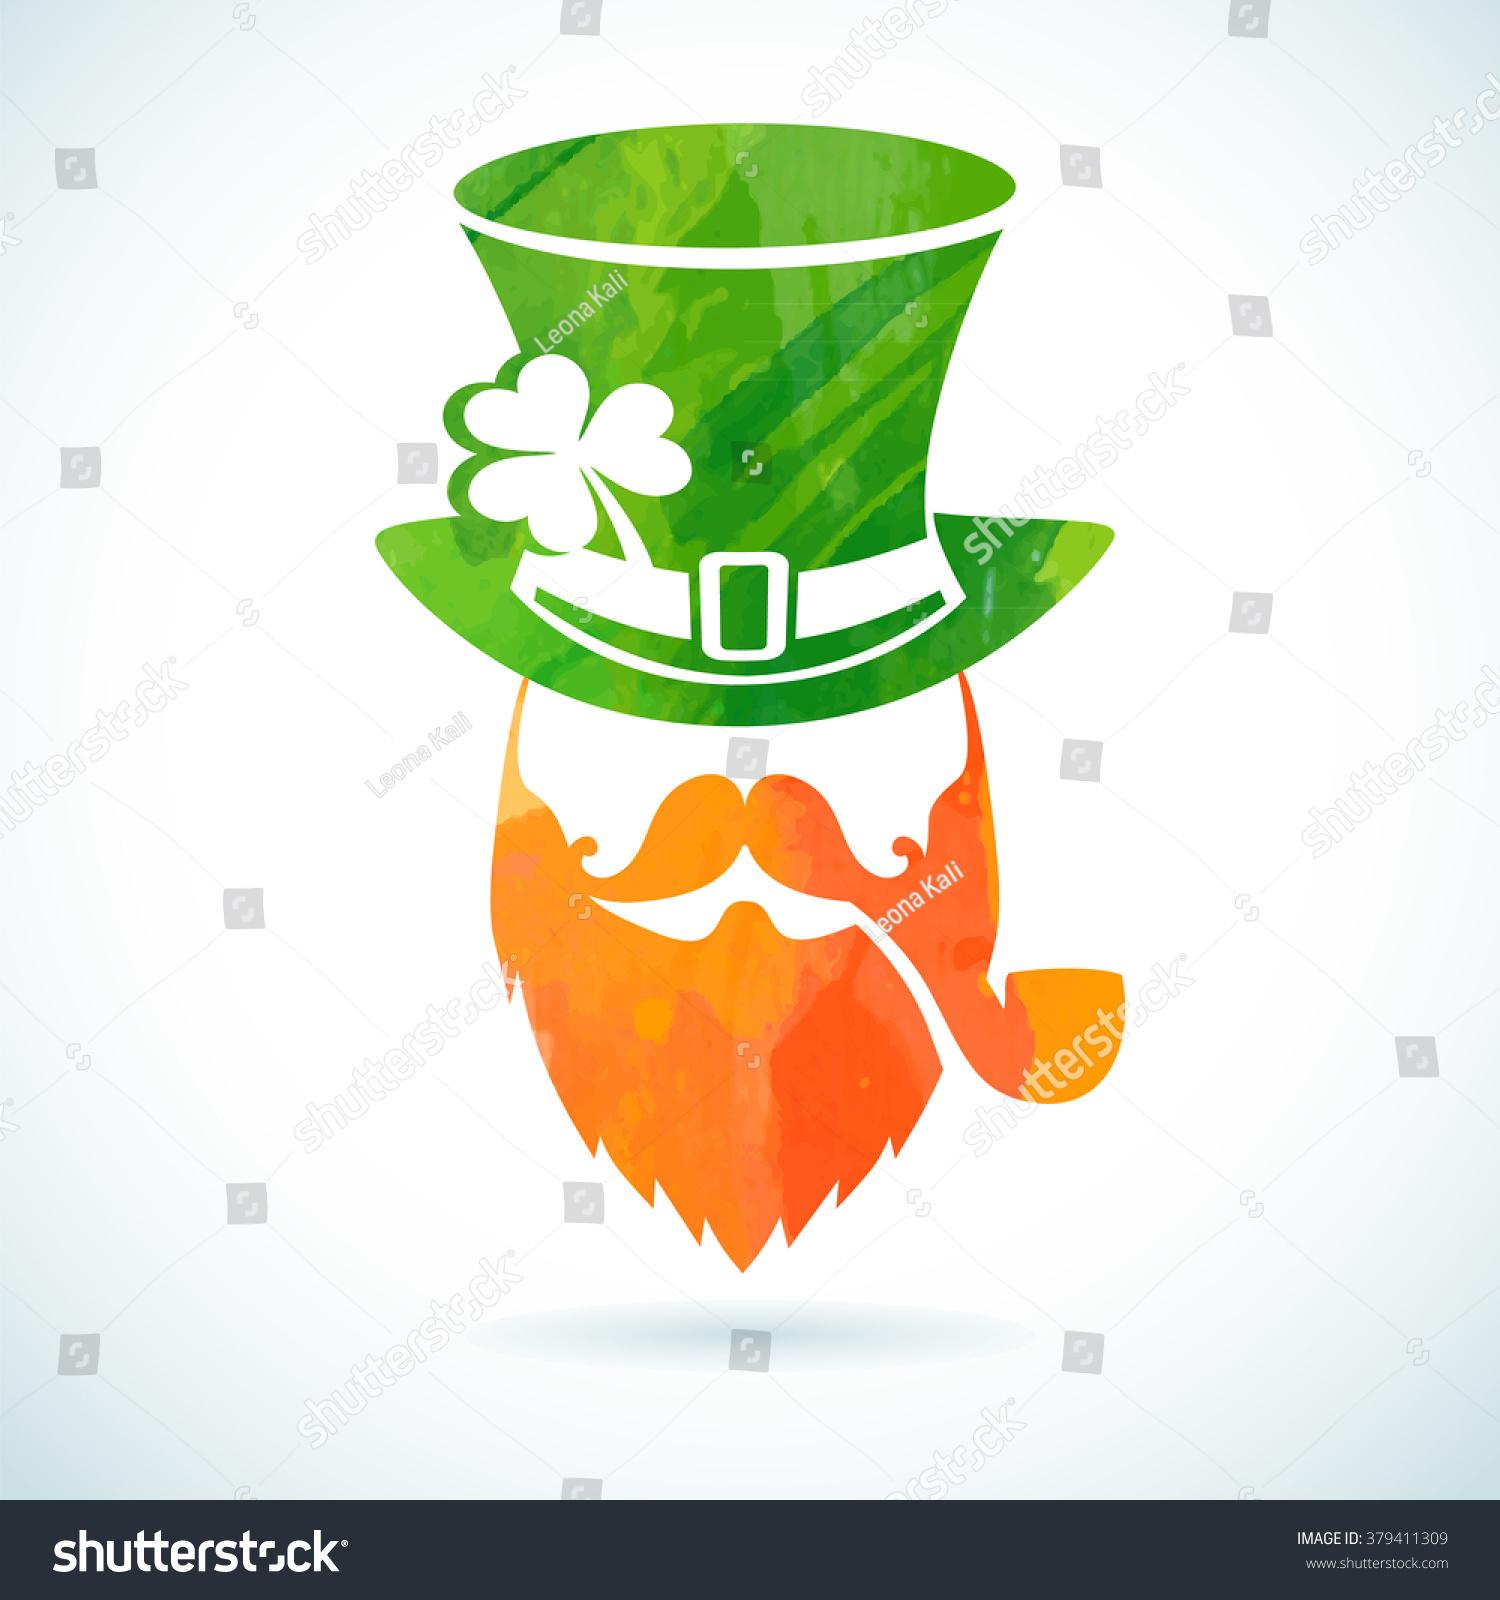 irish leprechaun logo greeting card template stock vector shamrock vector image shamrock vector art